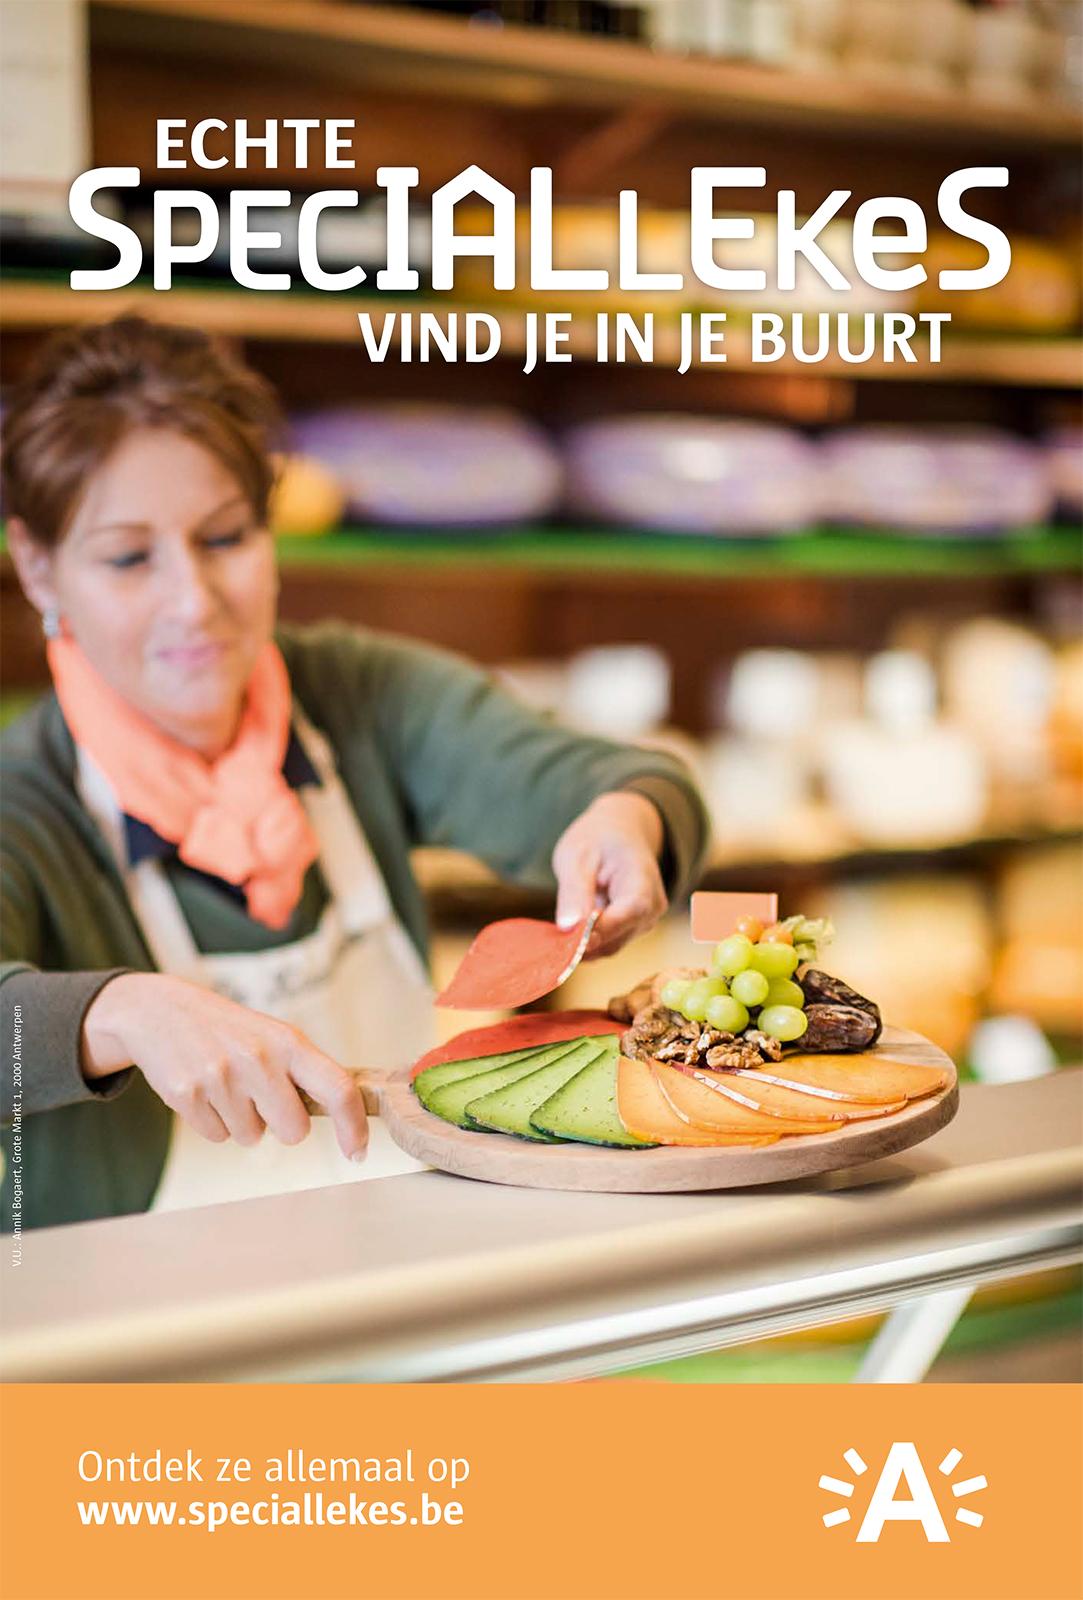 stad_buurtwinkel_abribus_350x237_nl_5-4.jpg